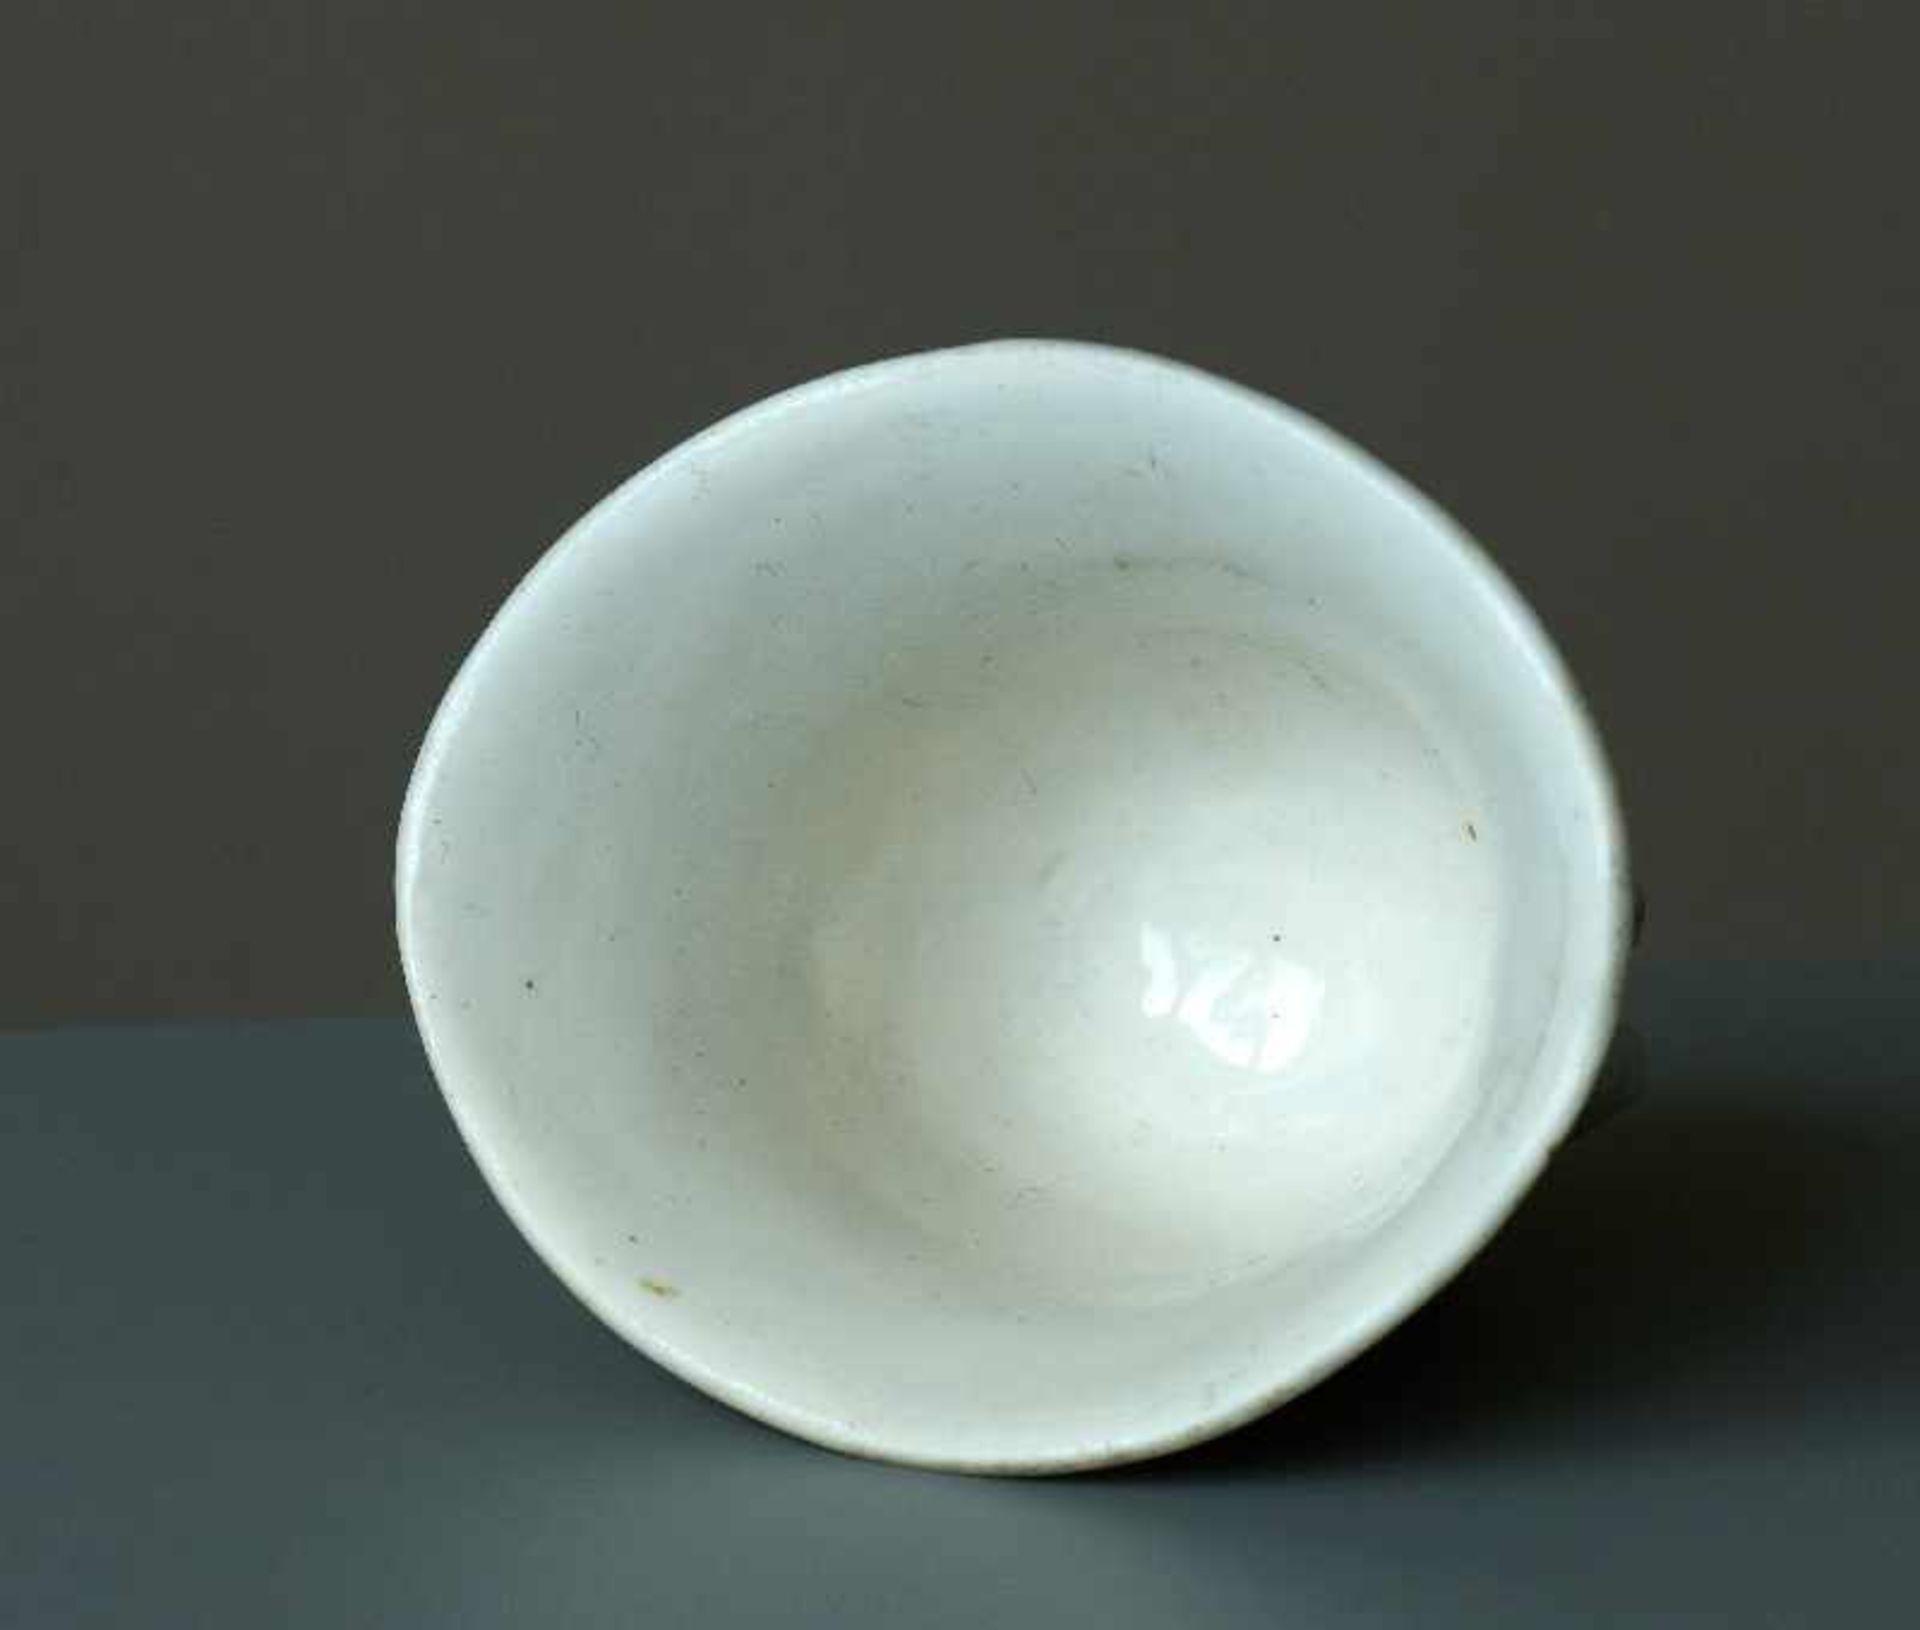 KLEINER BECHER Blanc de Chine-Porzellan. China, Qing-Dynastie Miniaturbecher in ovaler, - Image 4 of 5